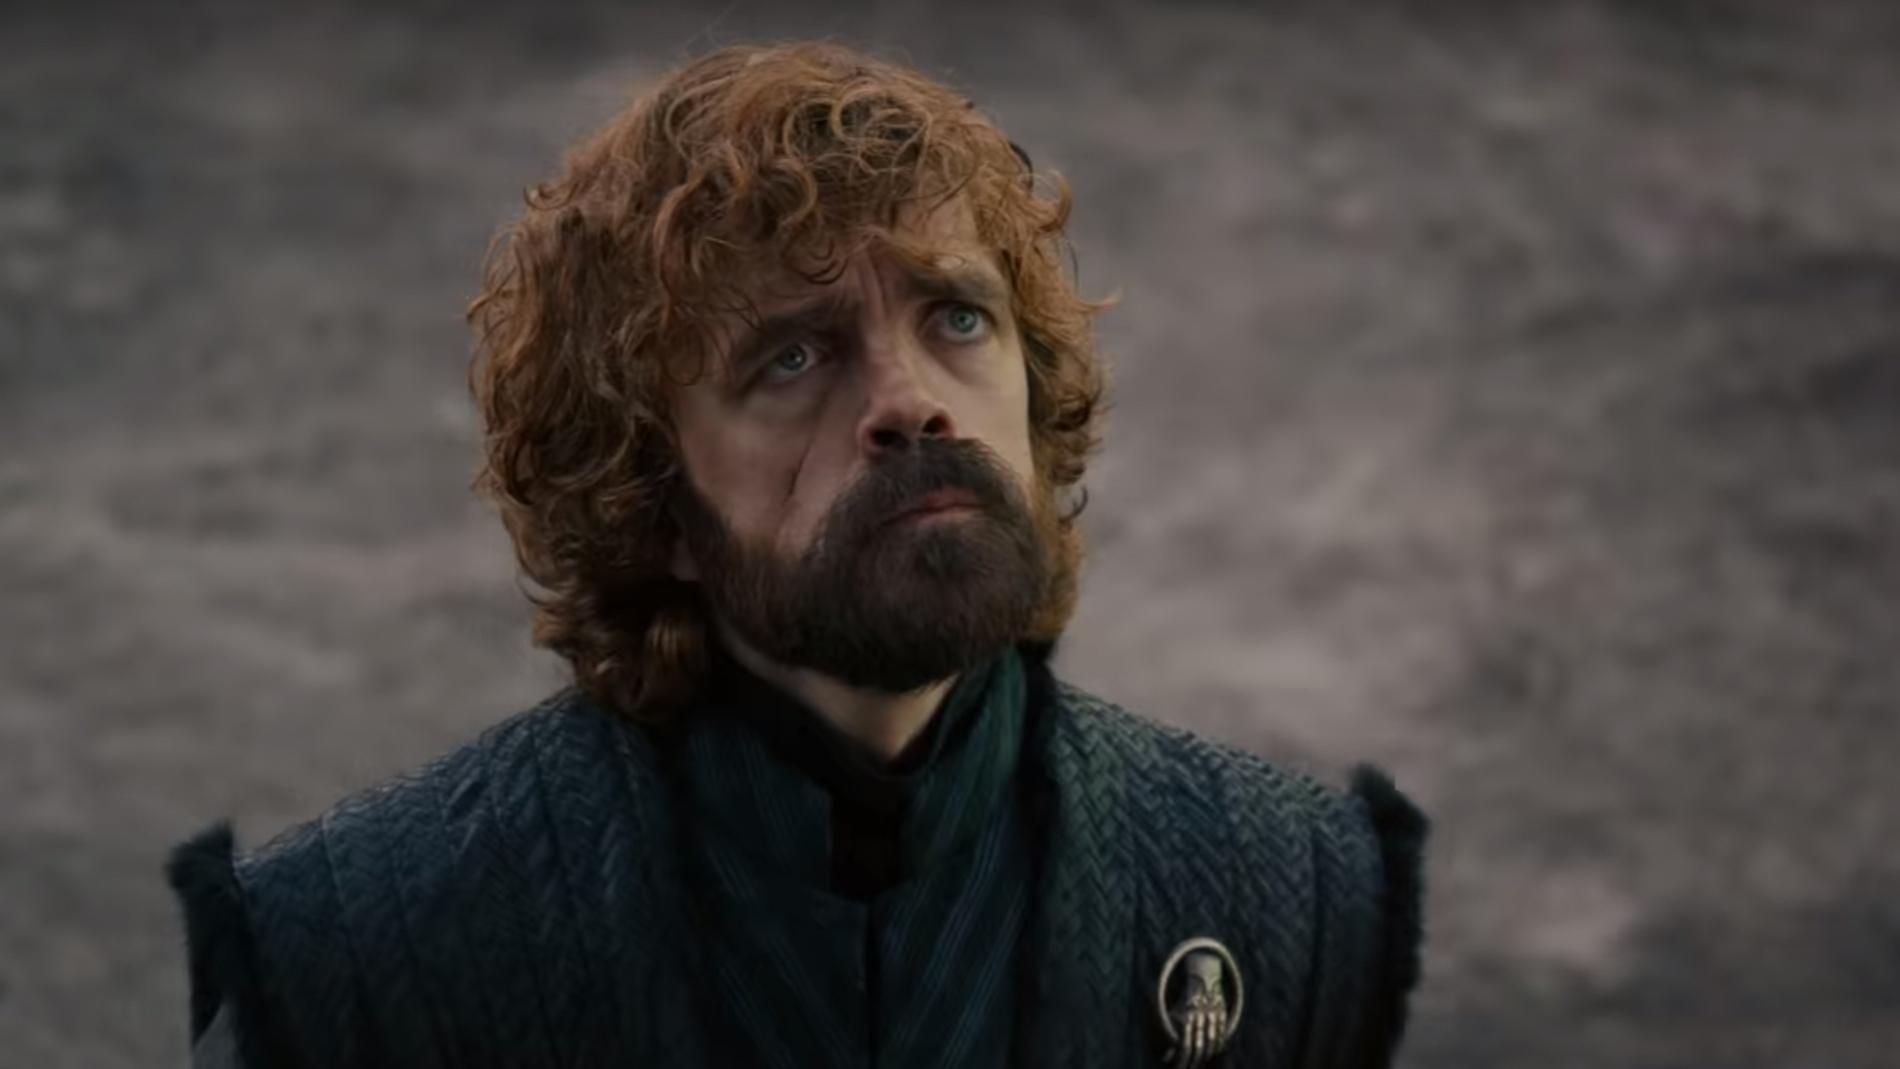 Tyrion Lannister, 'Juego de Tronos'